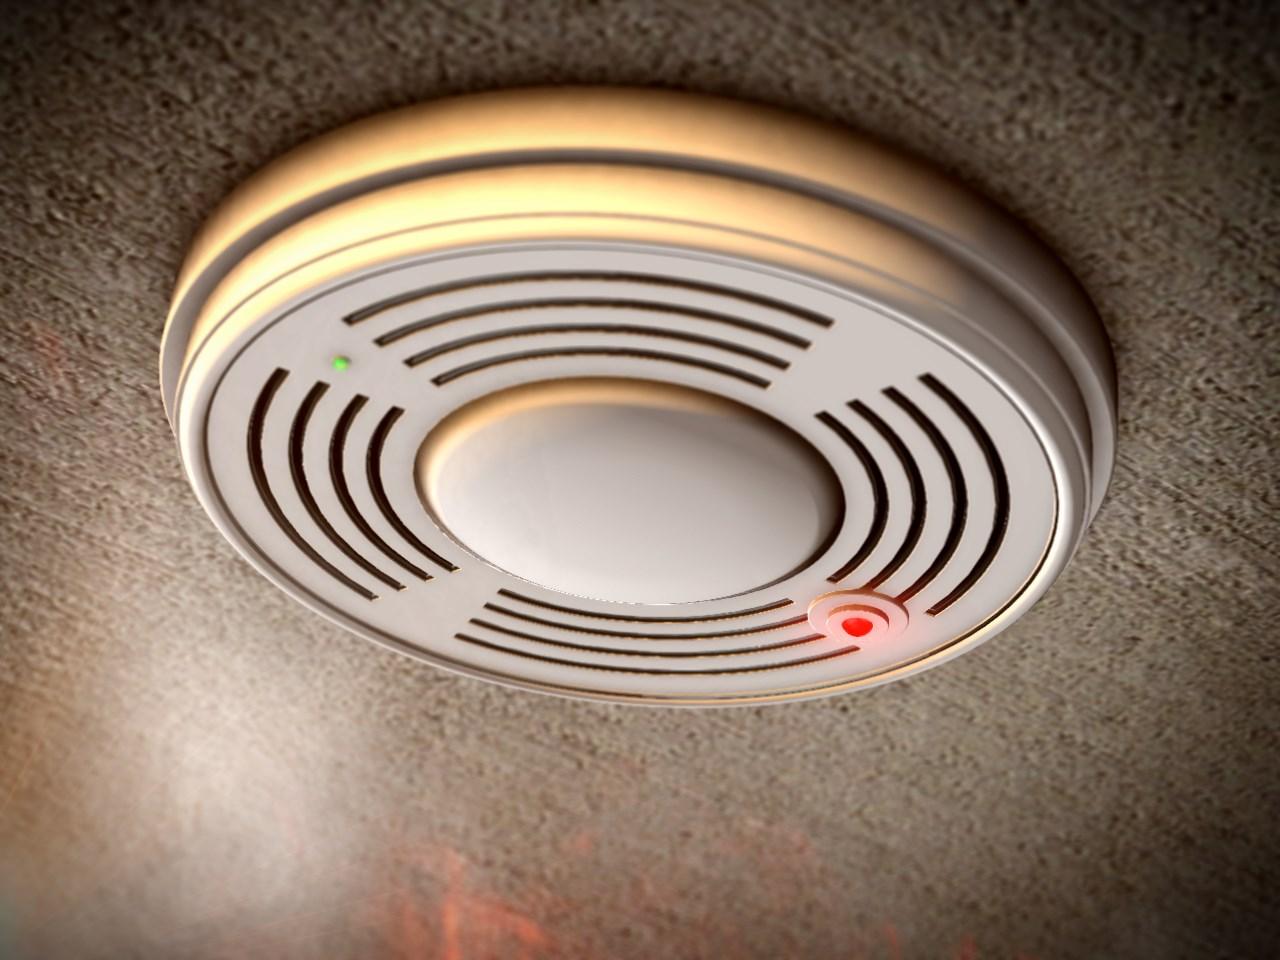 smoke alarm_1488492787029.jpg